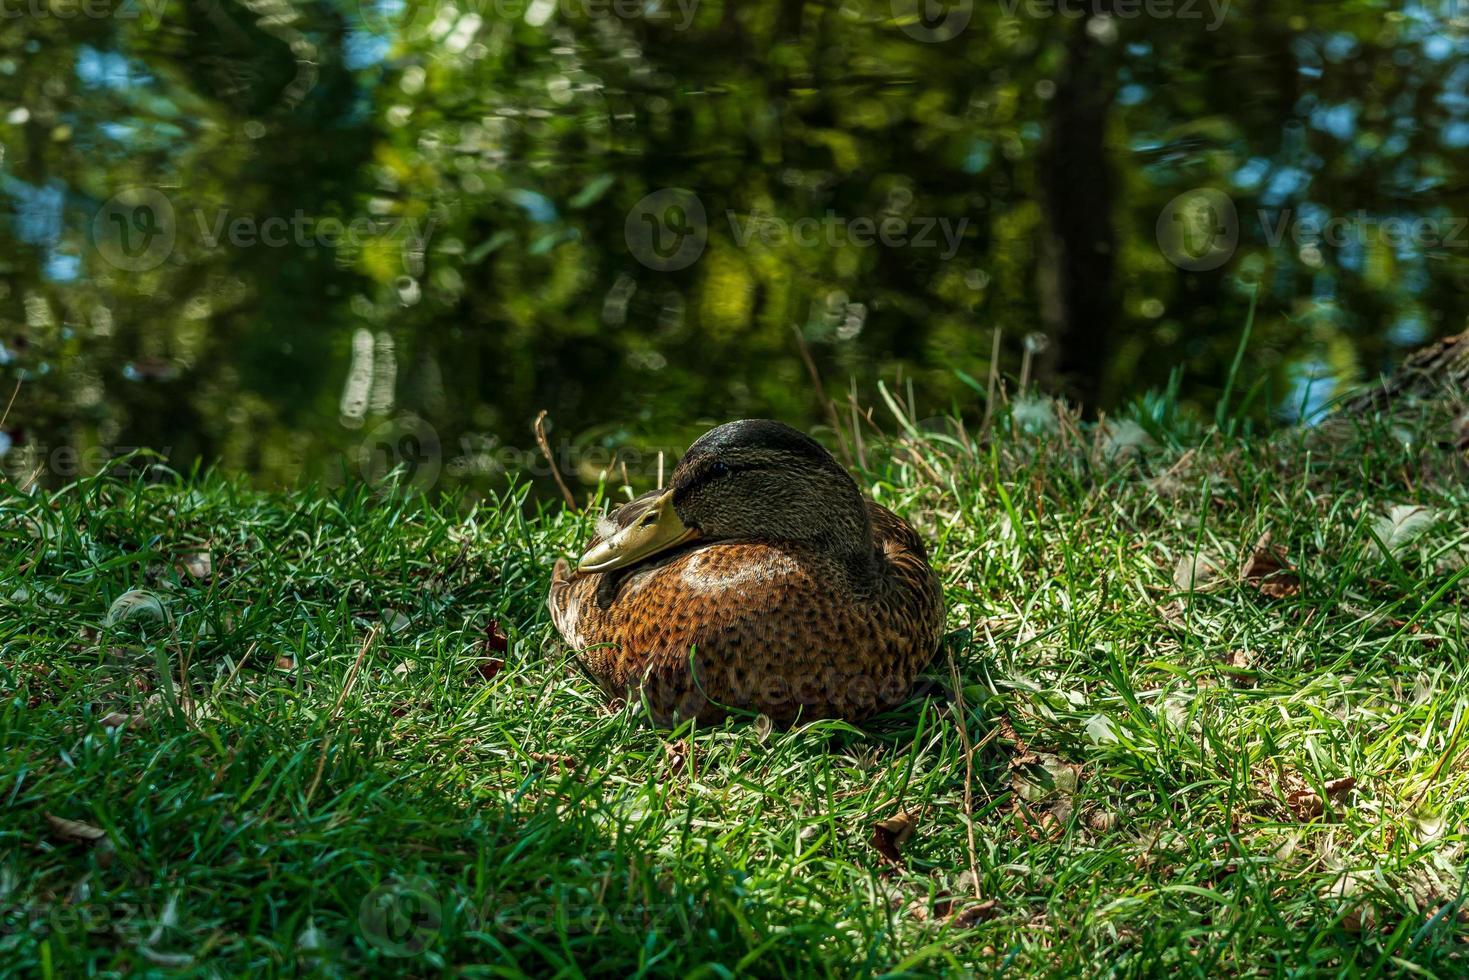 Canard colvert femelle au repos dans l'herbe verte photo